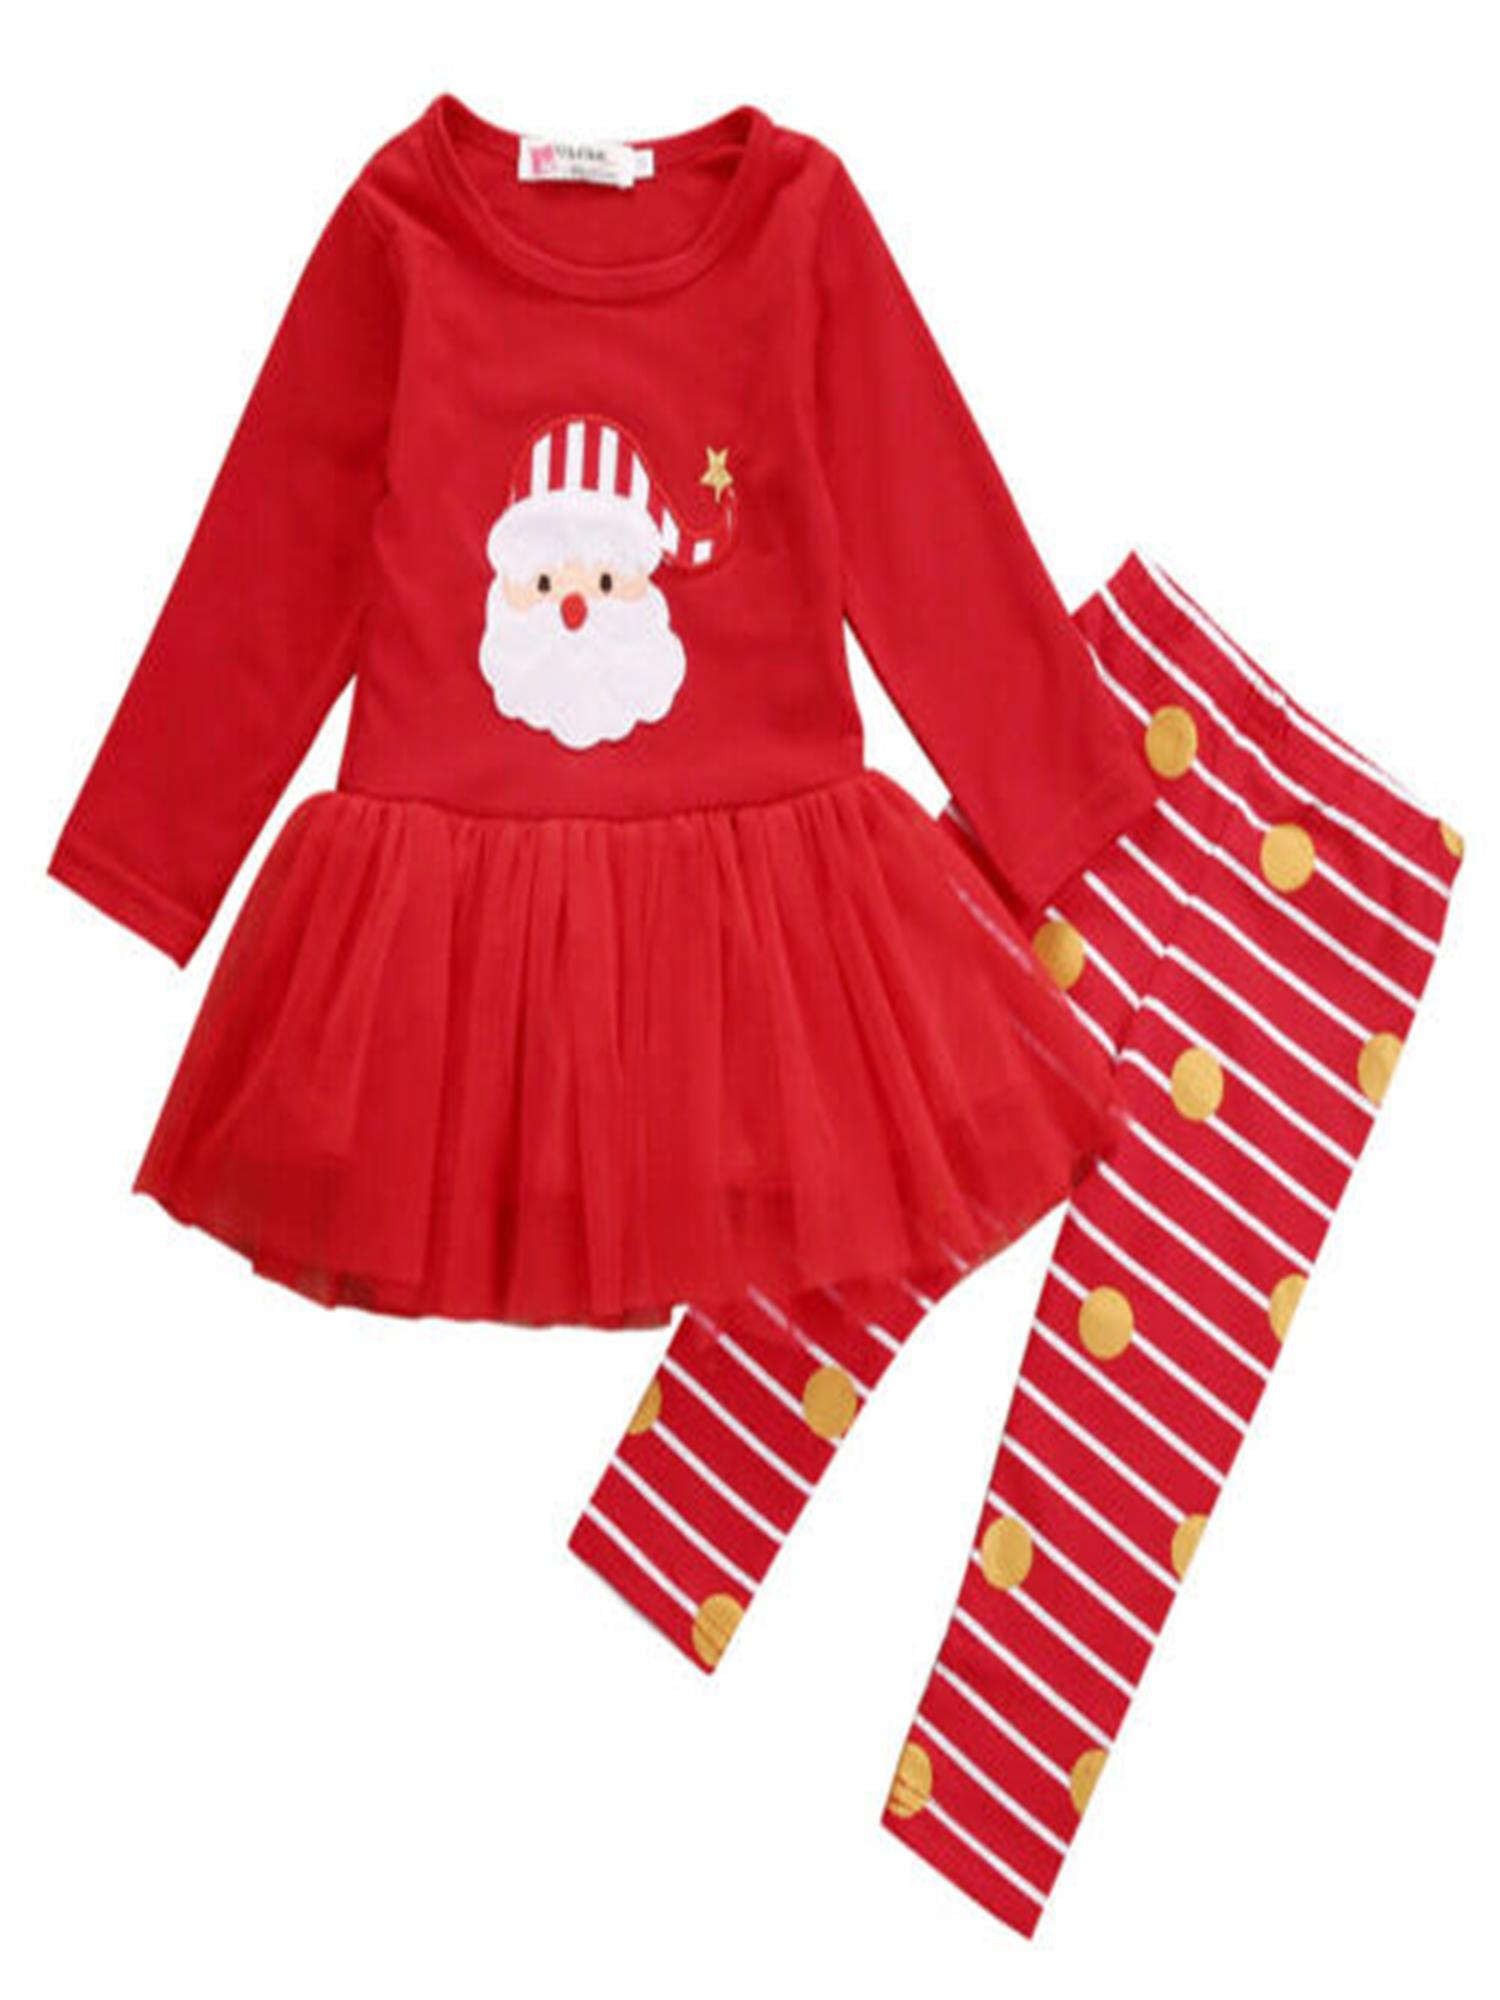 Black Santa Leggings Christmas Costume Kids Childrens Christmas Clothes Baby Christmas Party Outfit Xmas Gift Black Christmas Leggings